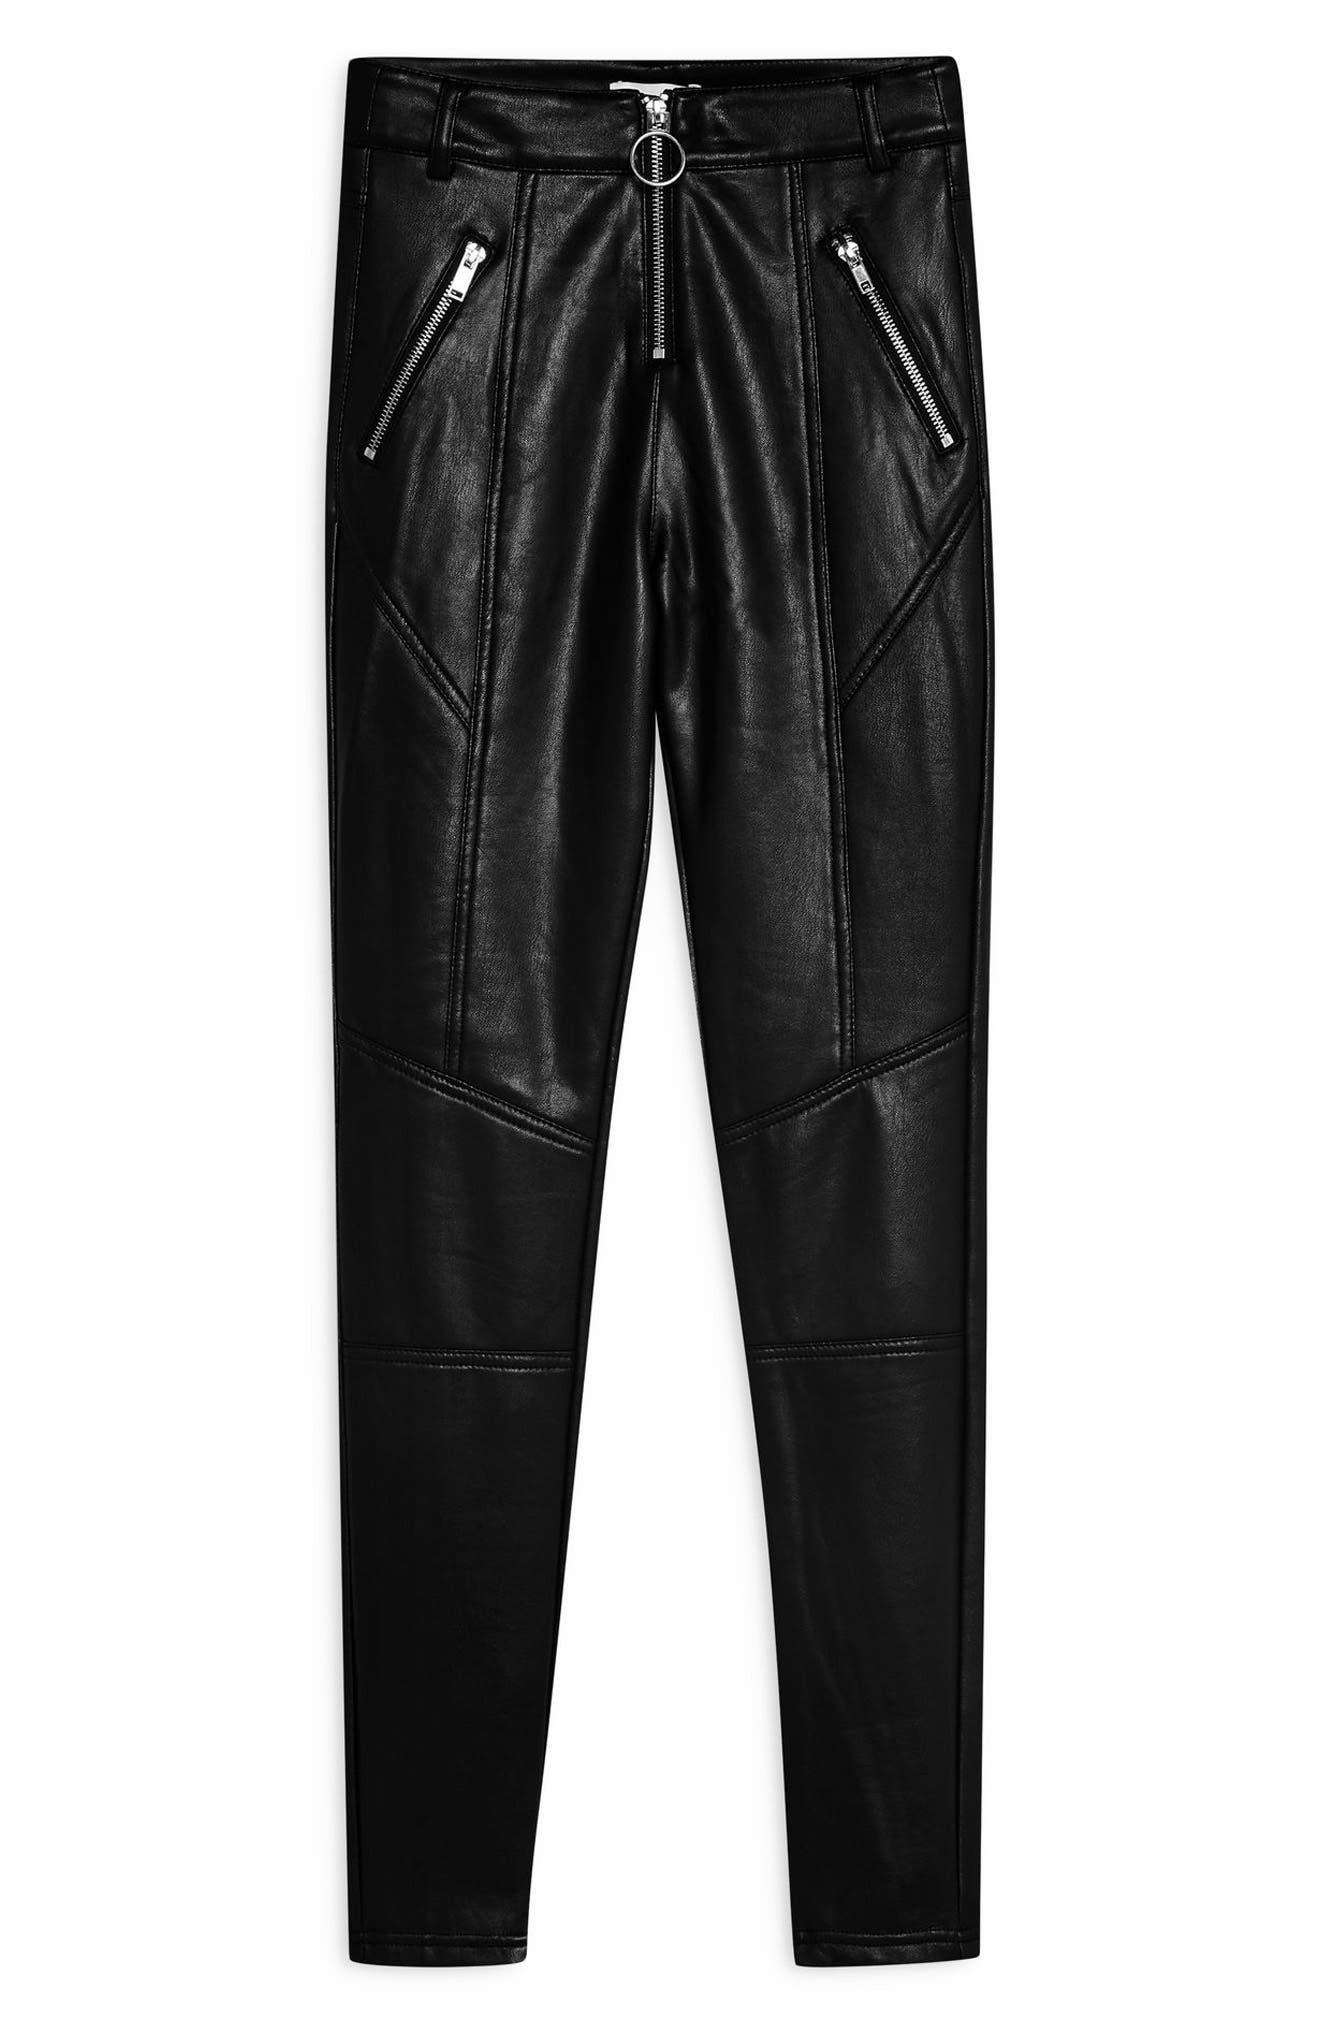 TOPSHOP, Faux Leather Skinny Biker Pants, Alternate thumbnail 5, color, BLACK